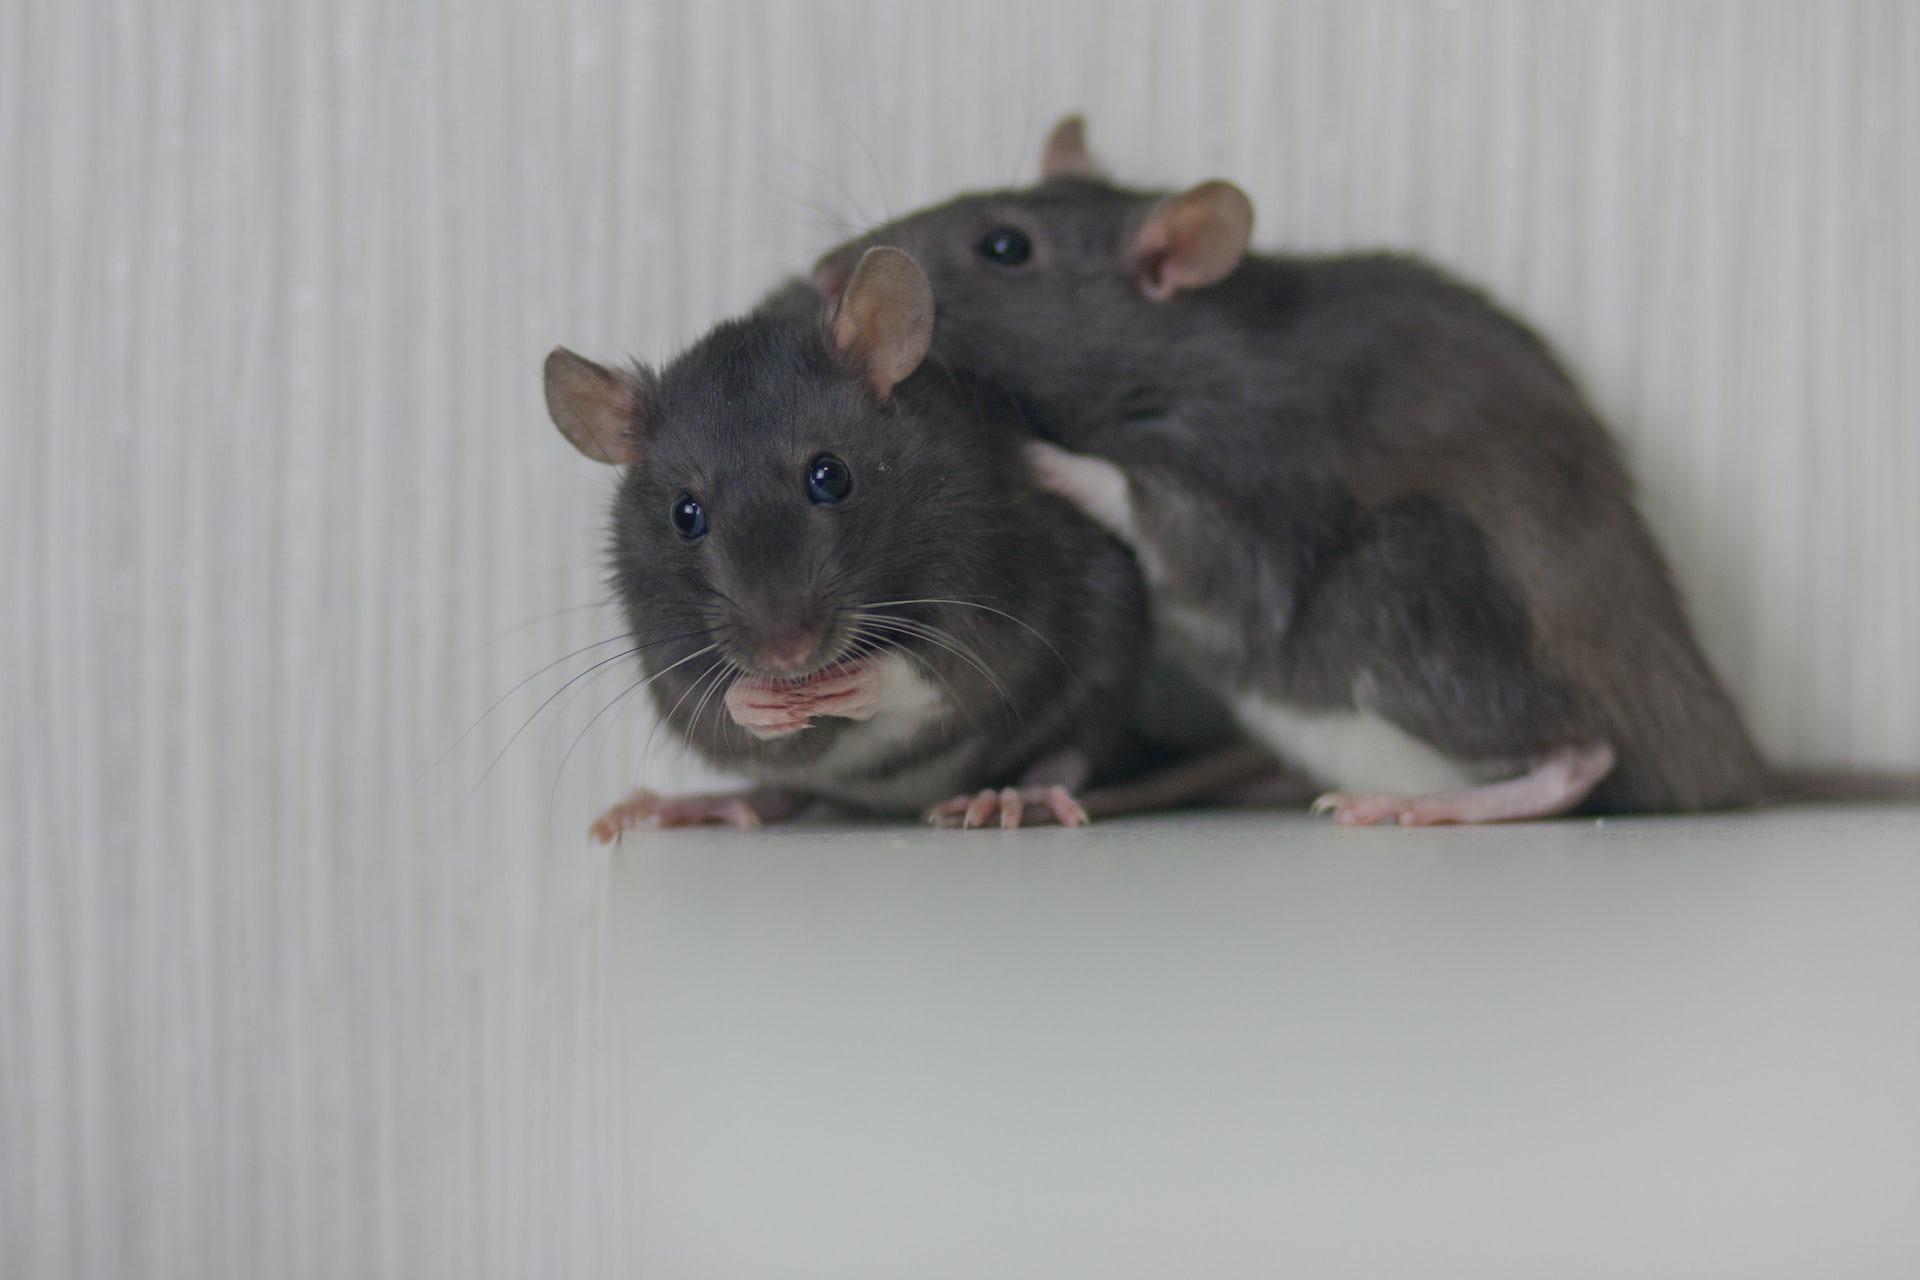 How to sex a rat